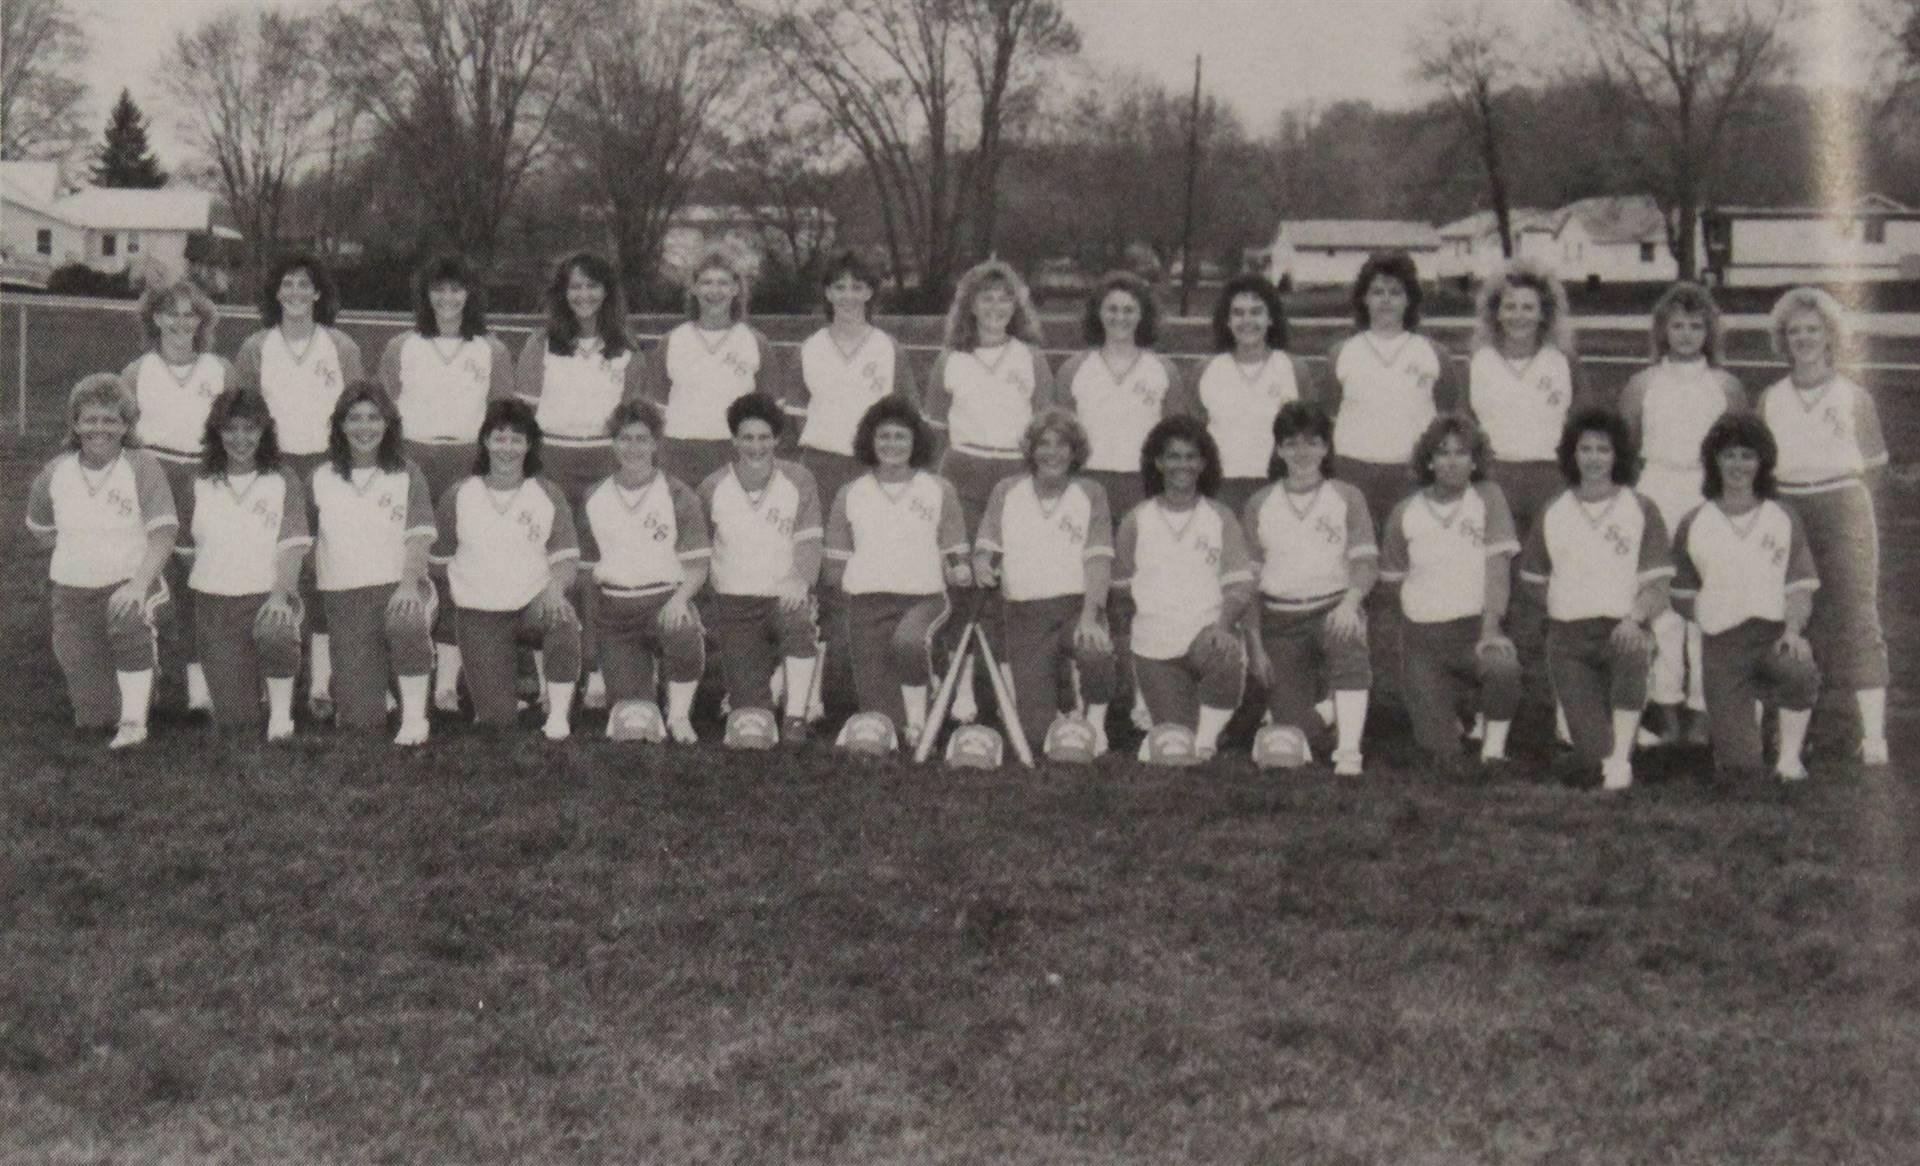 1988 Softball